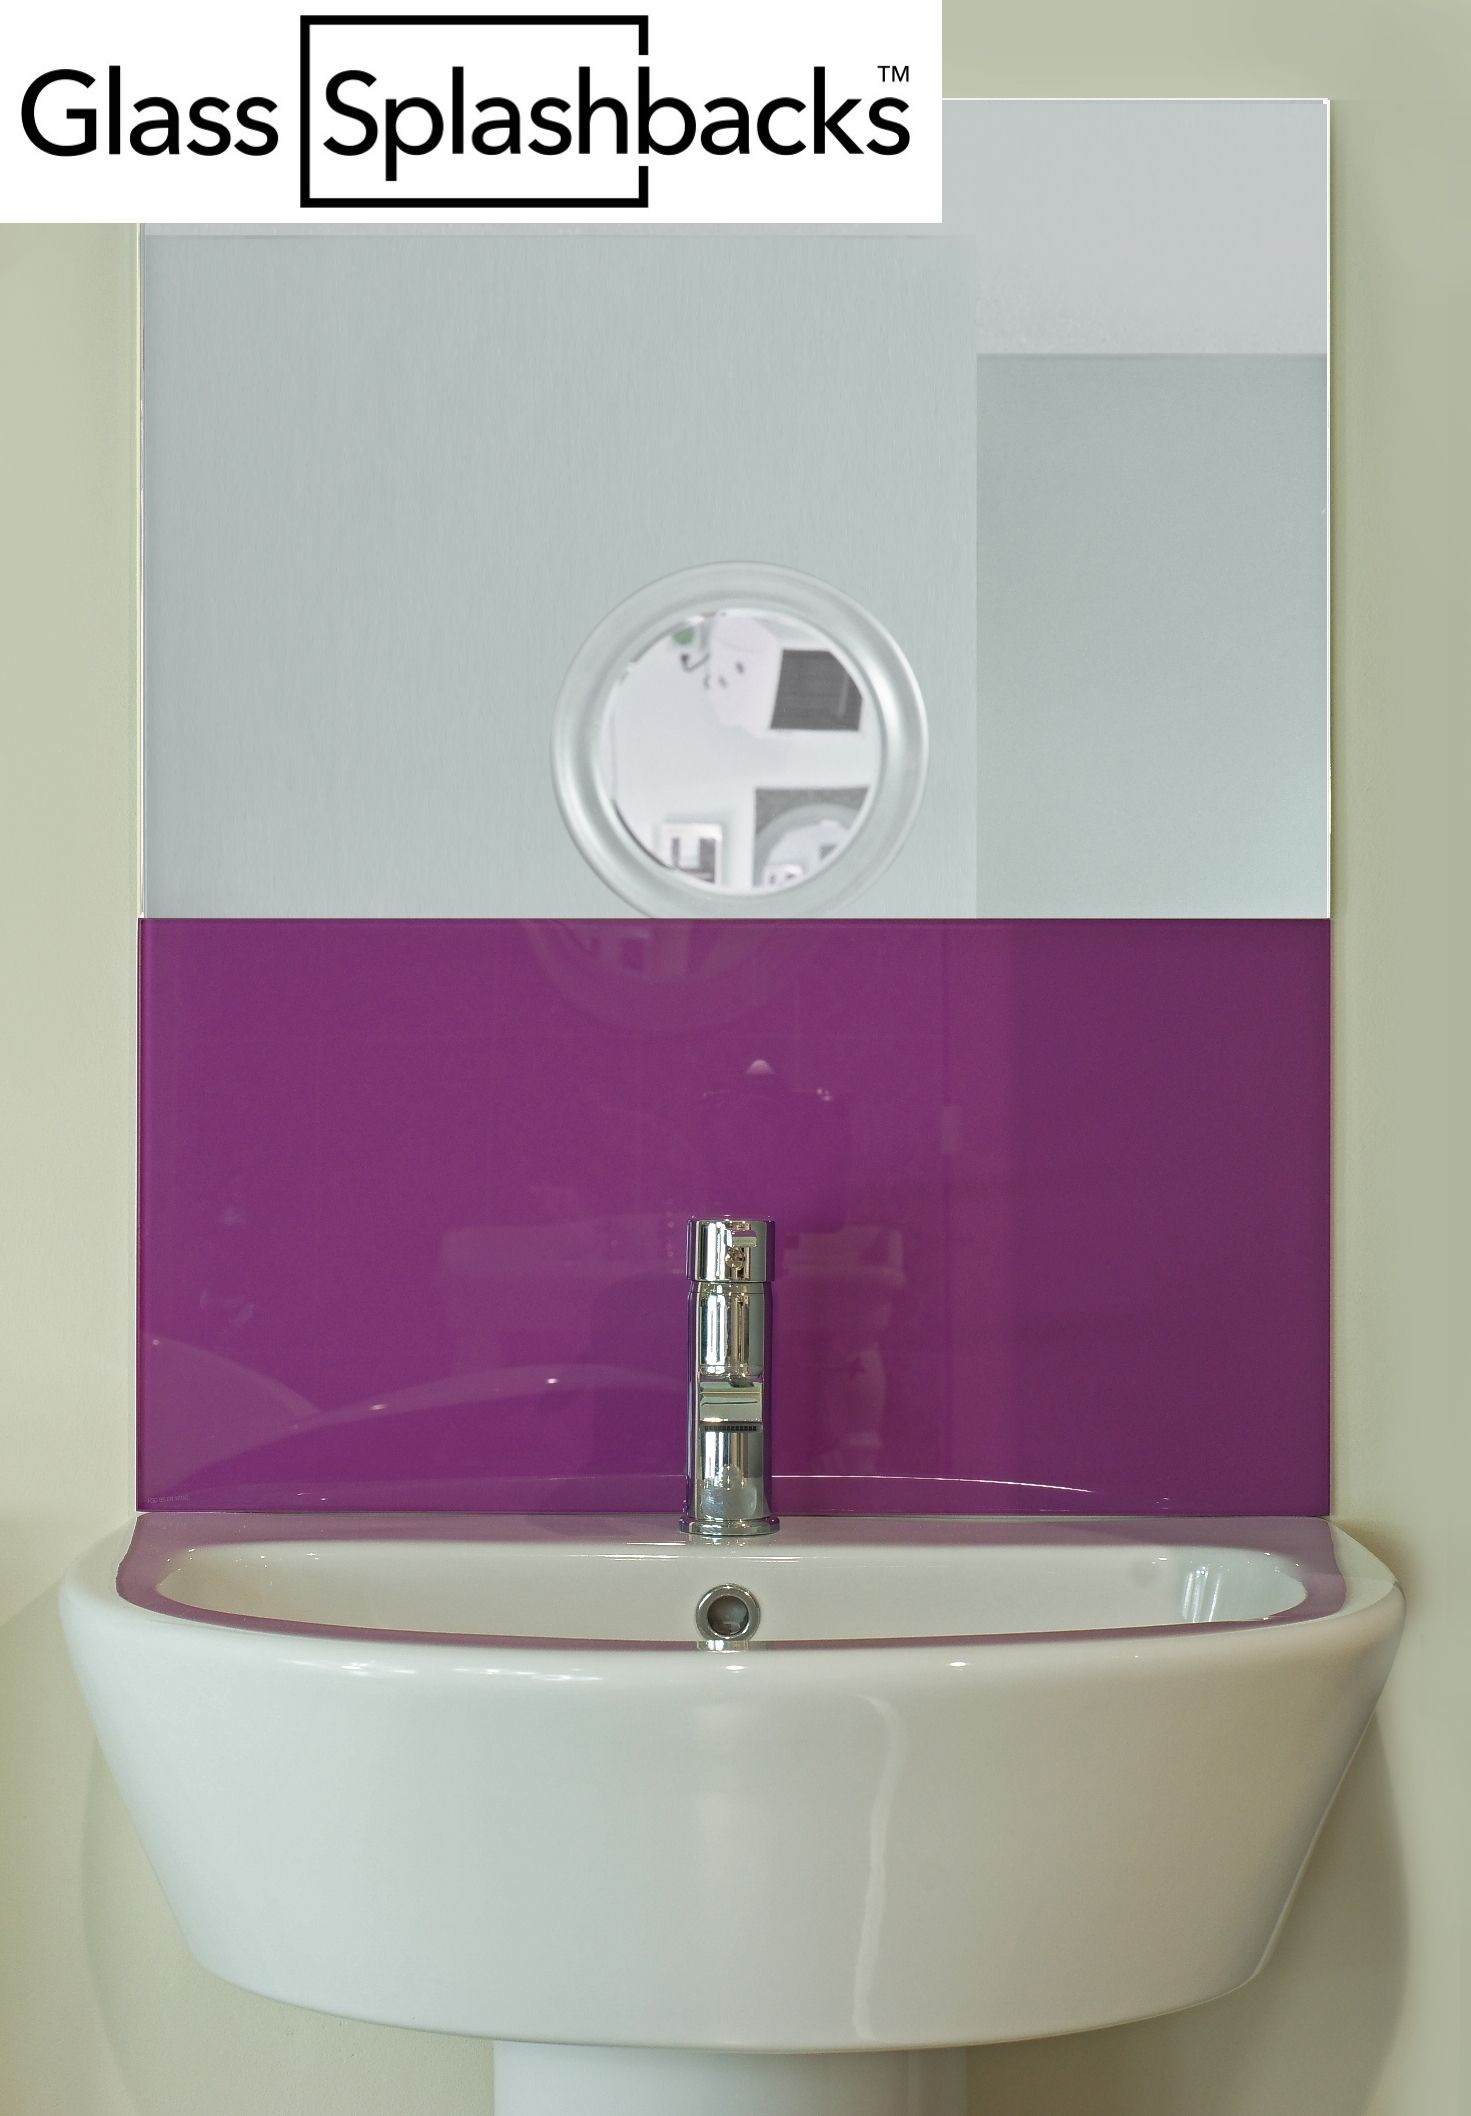 Bathroom sink splashback ideas - Purple Glass Sink Splashback By Glasssplashbacks Com Shop Our Range Of Standard Sized Sink Splashbacks